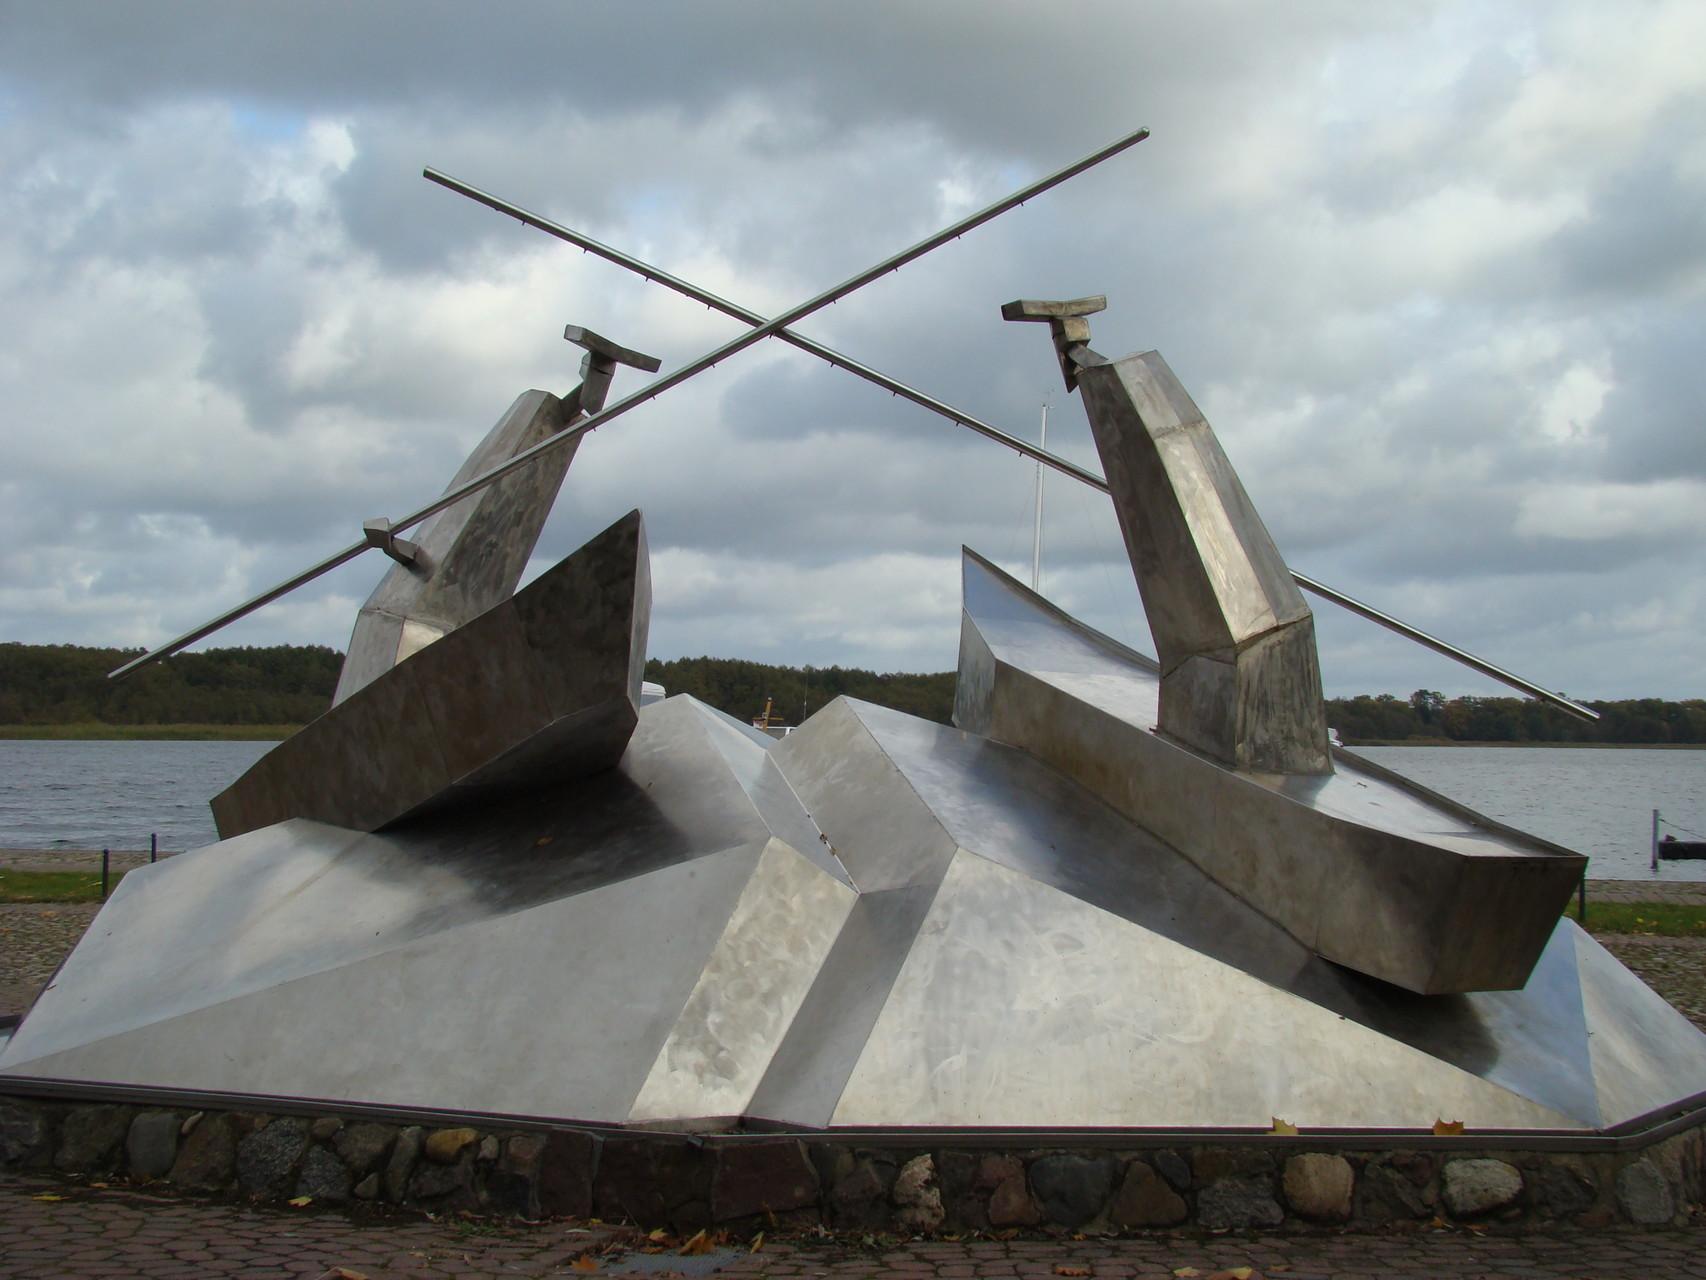 Seeschlacht, Wustrau